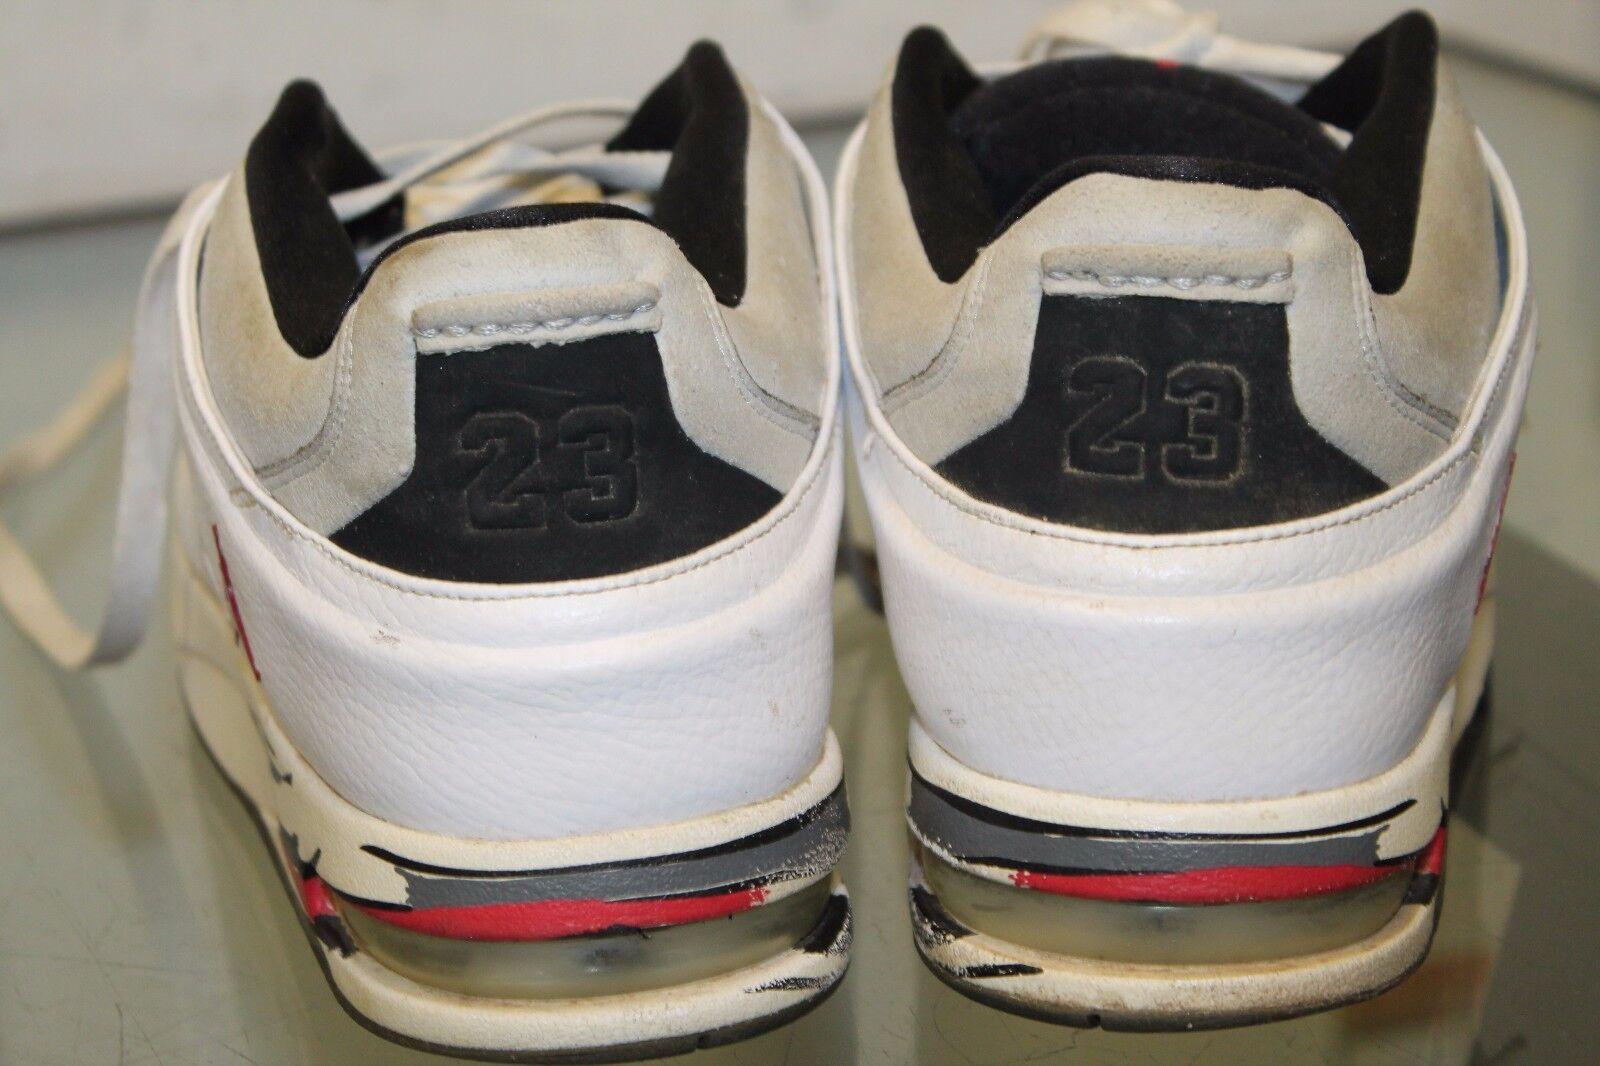 quality design 41524 02d64 ... Nike jordan jordan jordan zapatillas de baloncesto blanco negro de cuero  clásico de 23 317770- ...